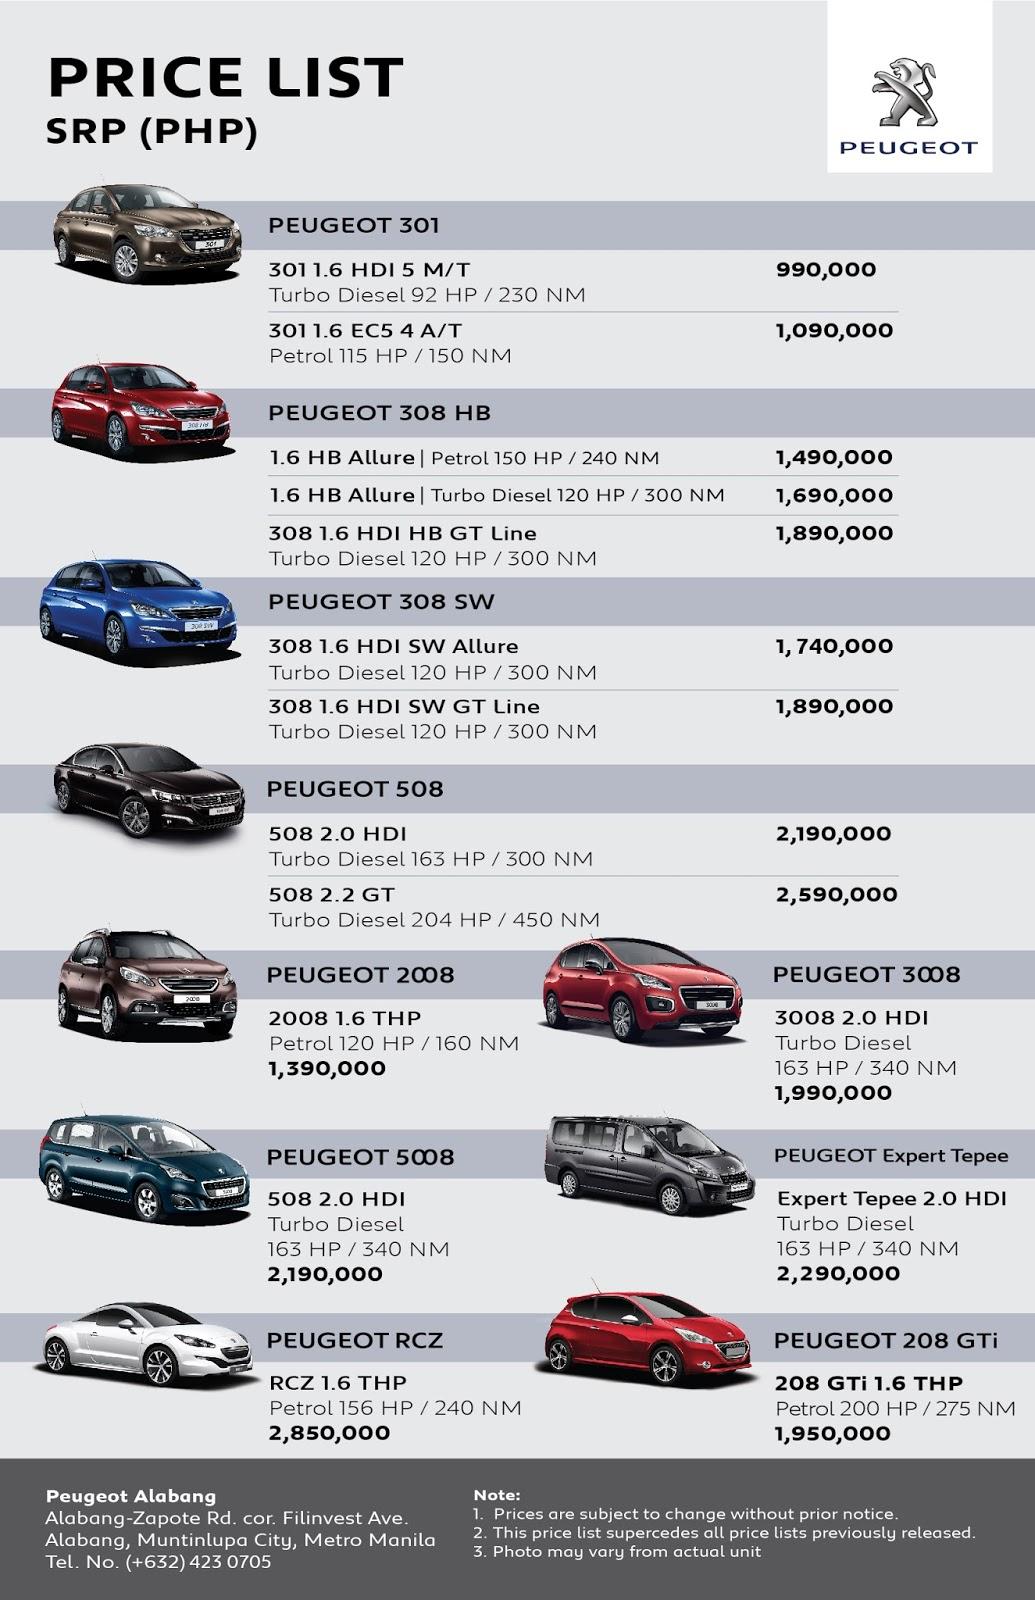 Kia Philippines Price List >> Peugeot Price List   British Automotive